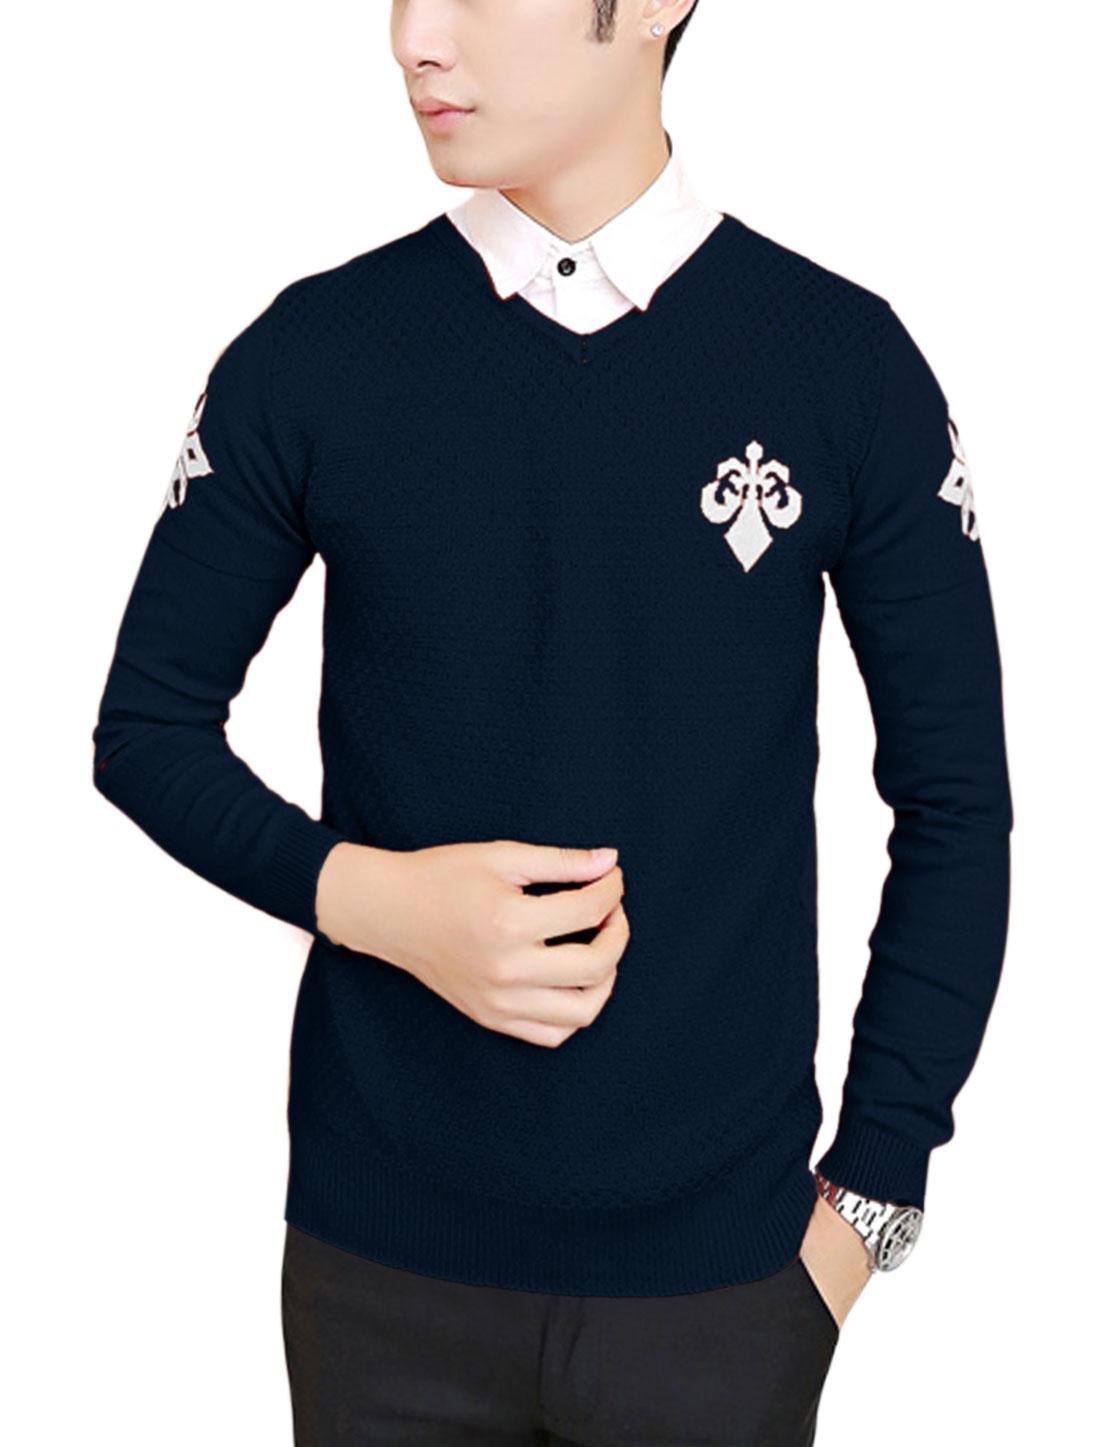 Men Pullover V Neck Letters Pattern Cozy Fit Knit Shirt Navy Blue M